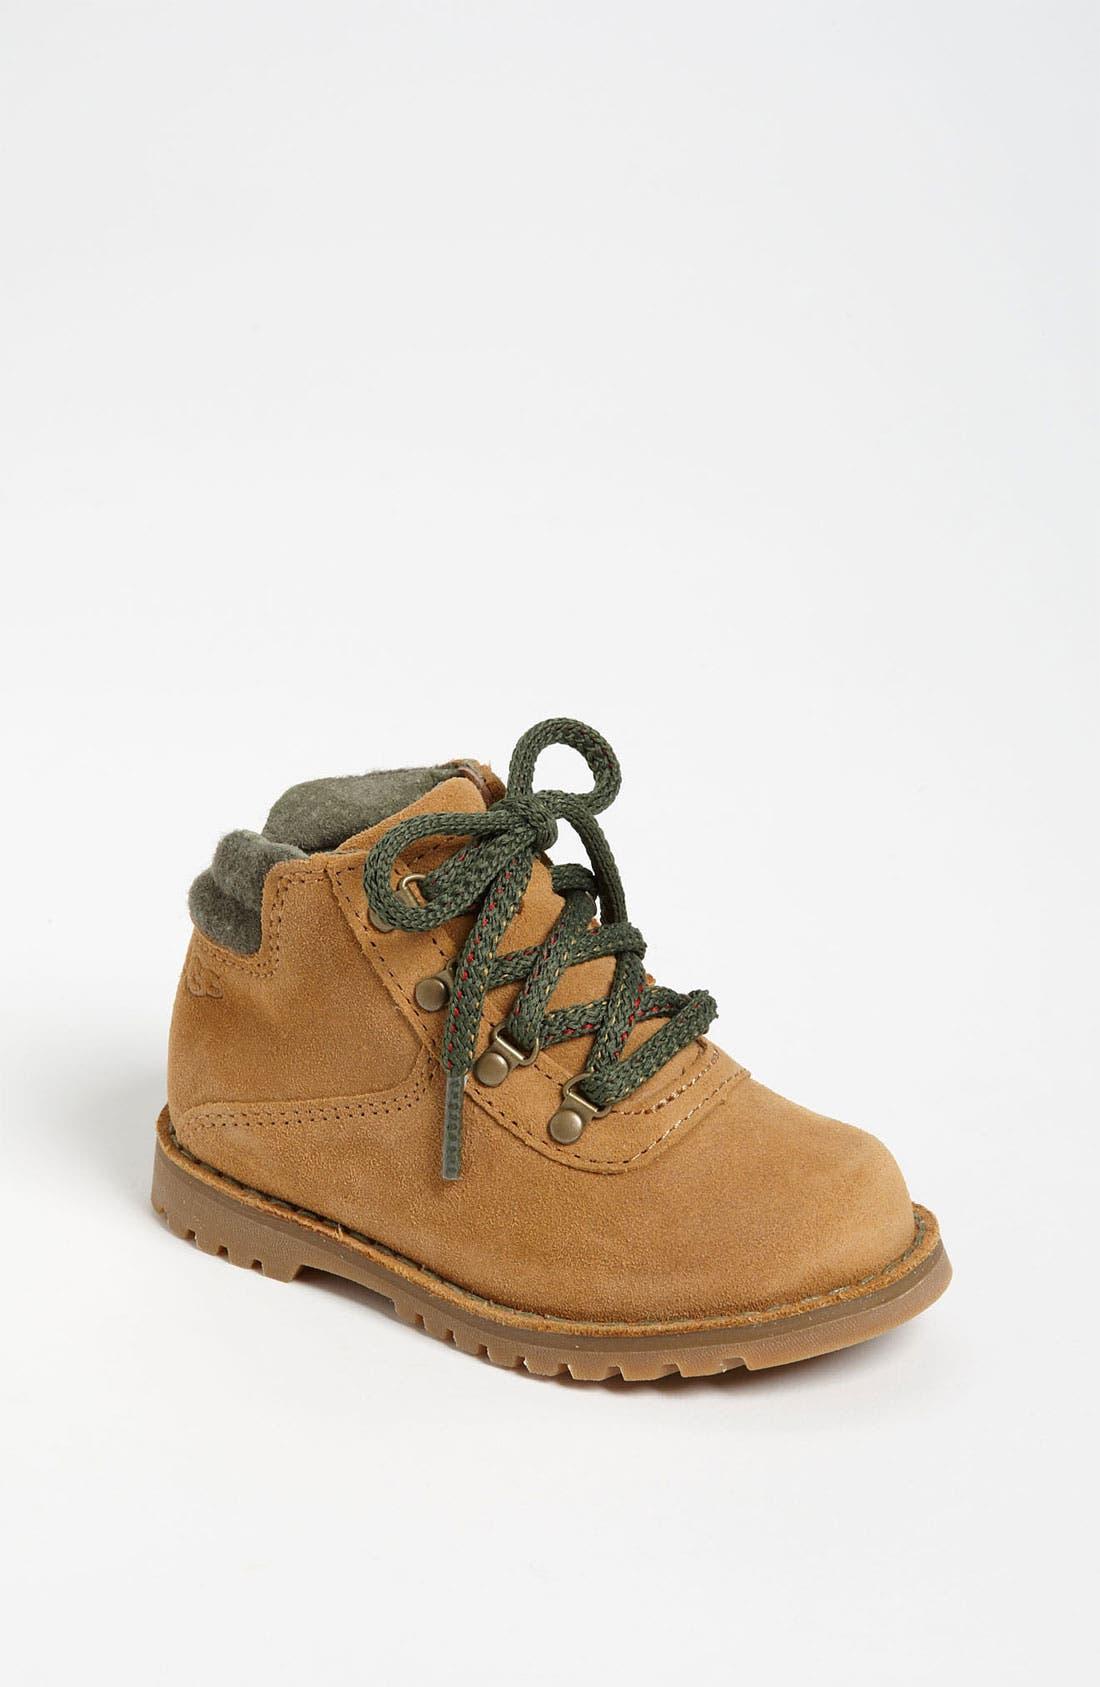 Alternate Image 1 Selected - UGG® Australia 'Payson' Boot (Walker & Toddler)